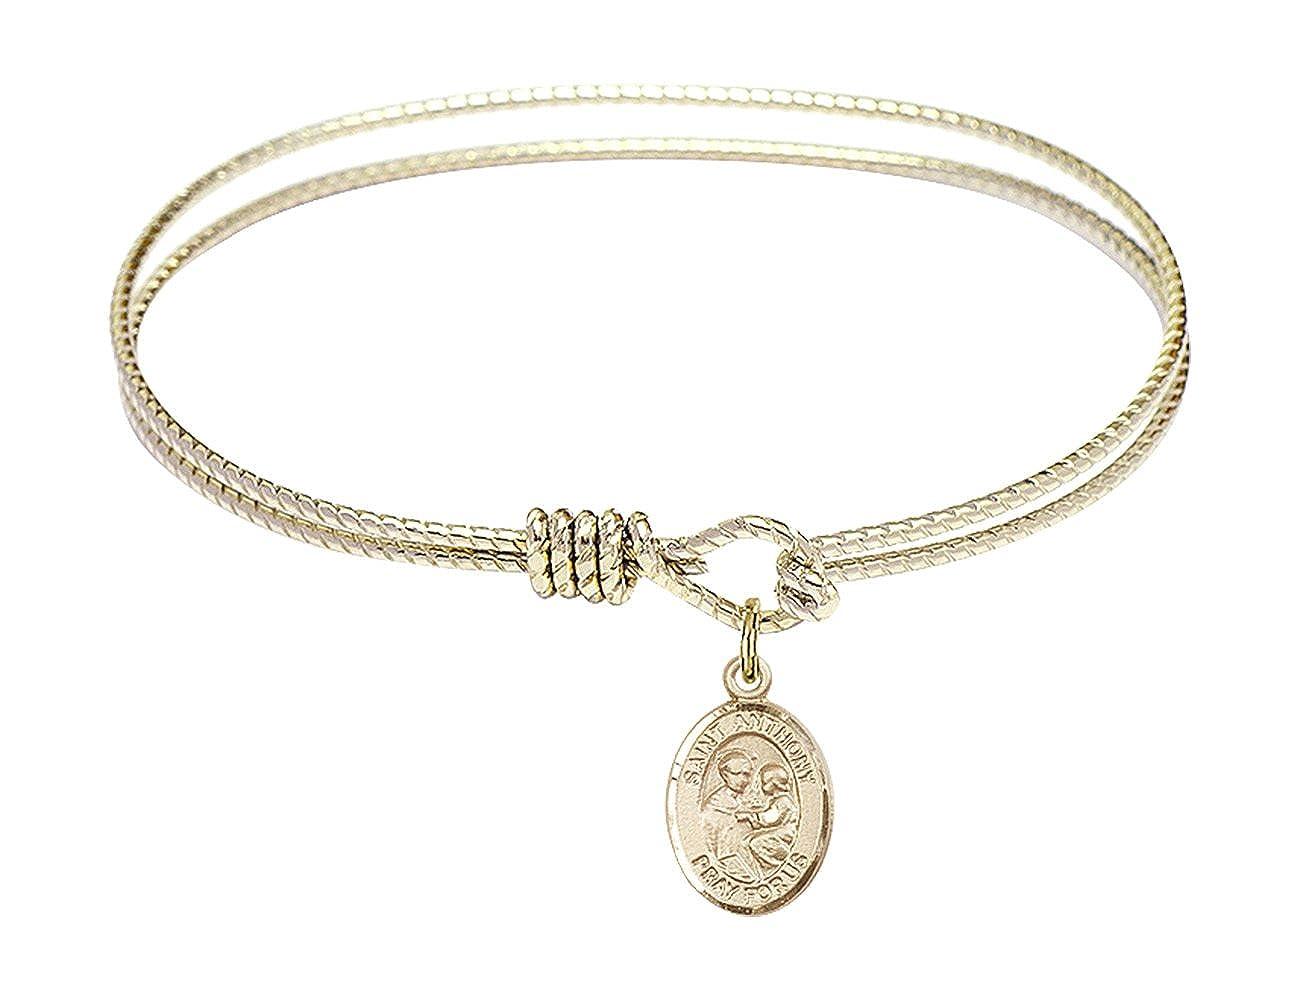 6 1/4 inch Oval Eye Hook Bangle Bracelet w/ St. Anthony of Padua medal charm Bonyak Jewelry B4205RG-9004GF